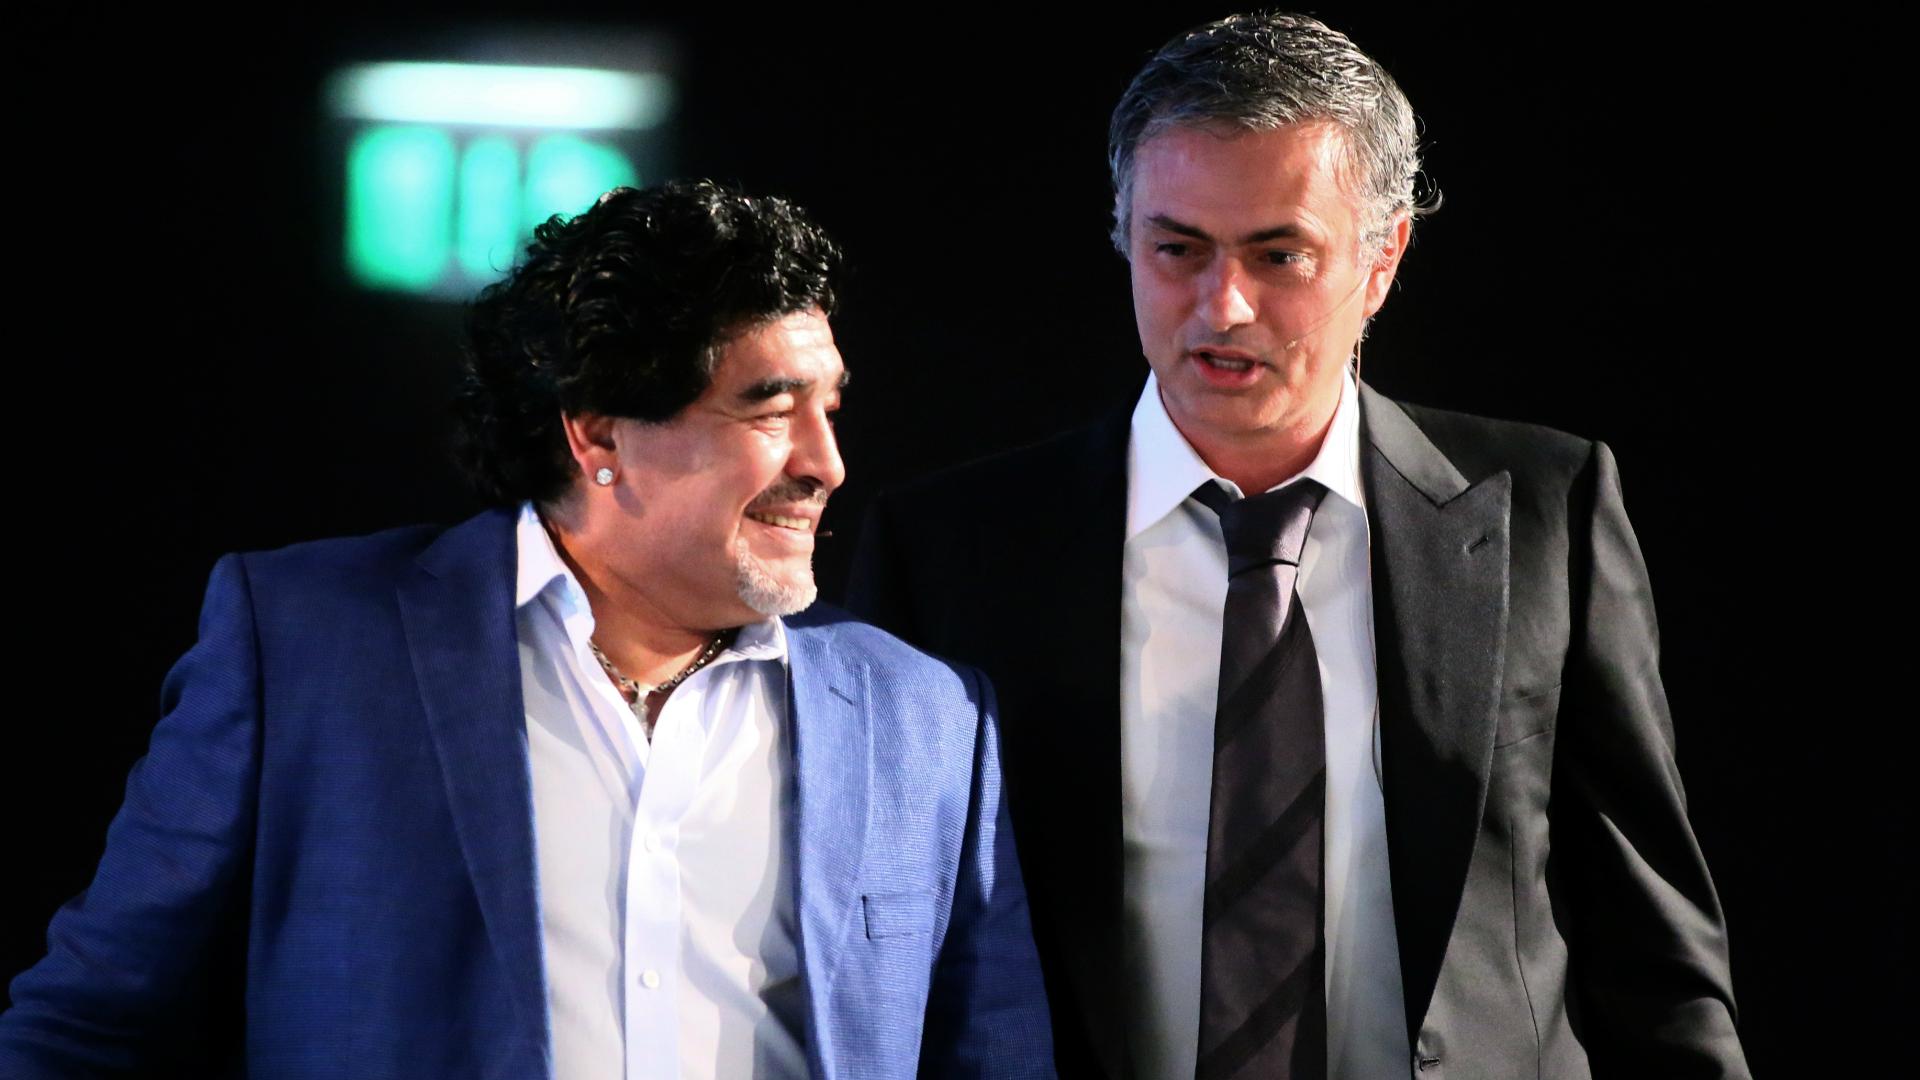 Diego Maradona dies: He would always call me after big defeats – Mourinho